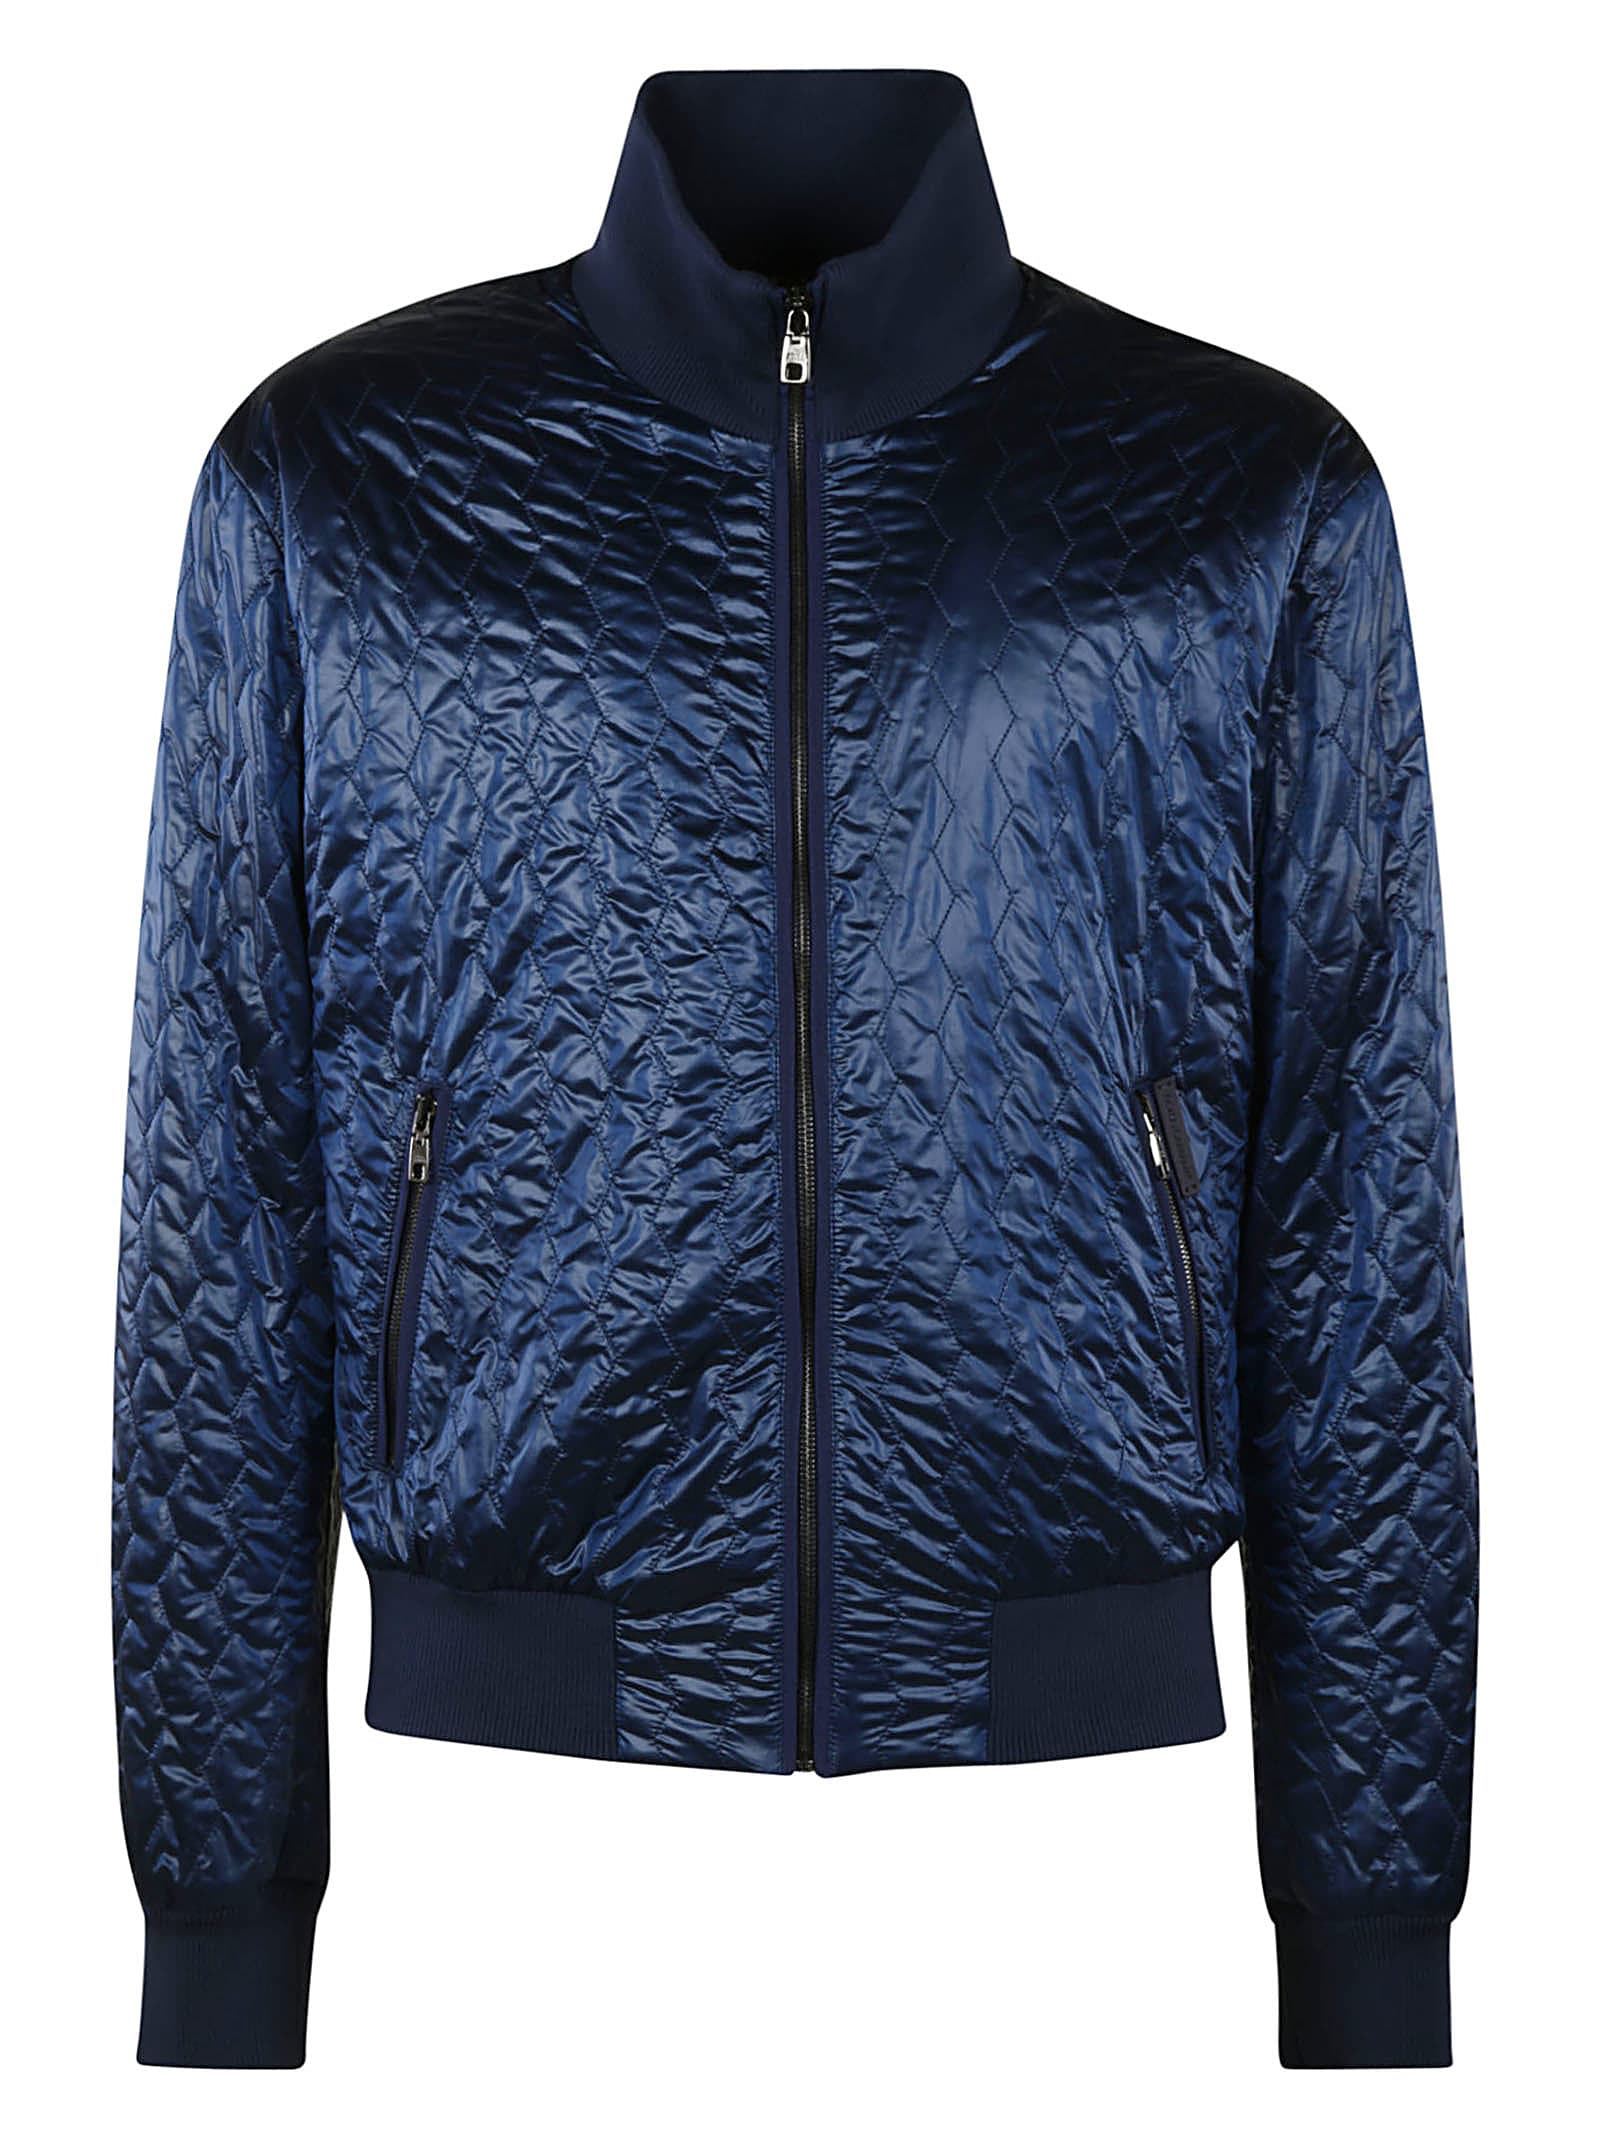 Dolce & Gabbana Quilted Zip Jacket